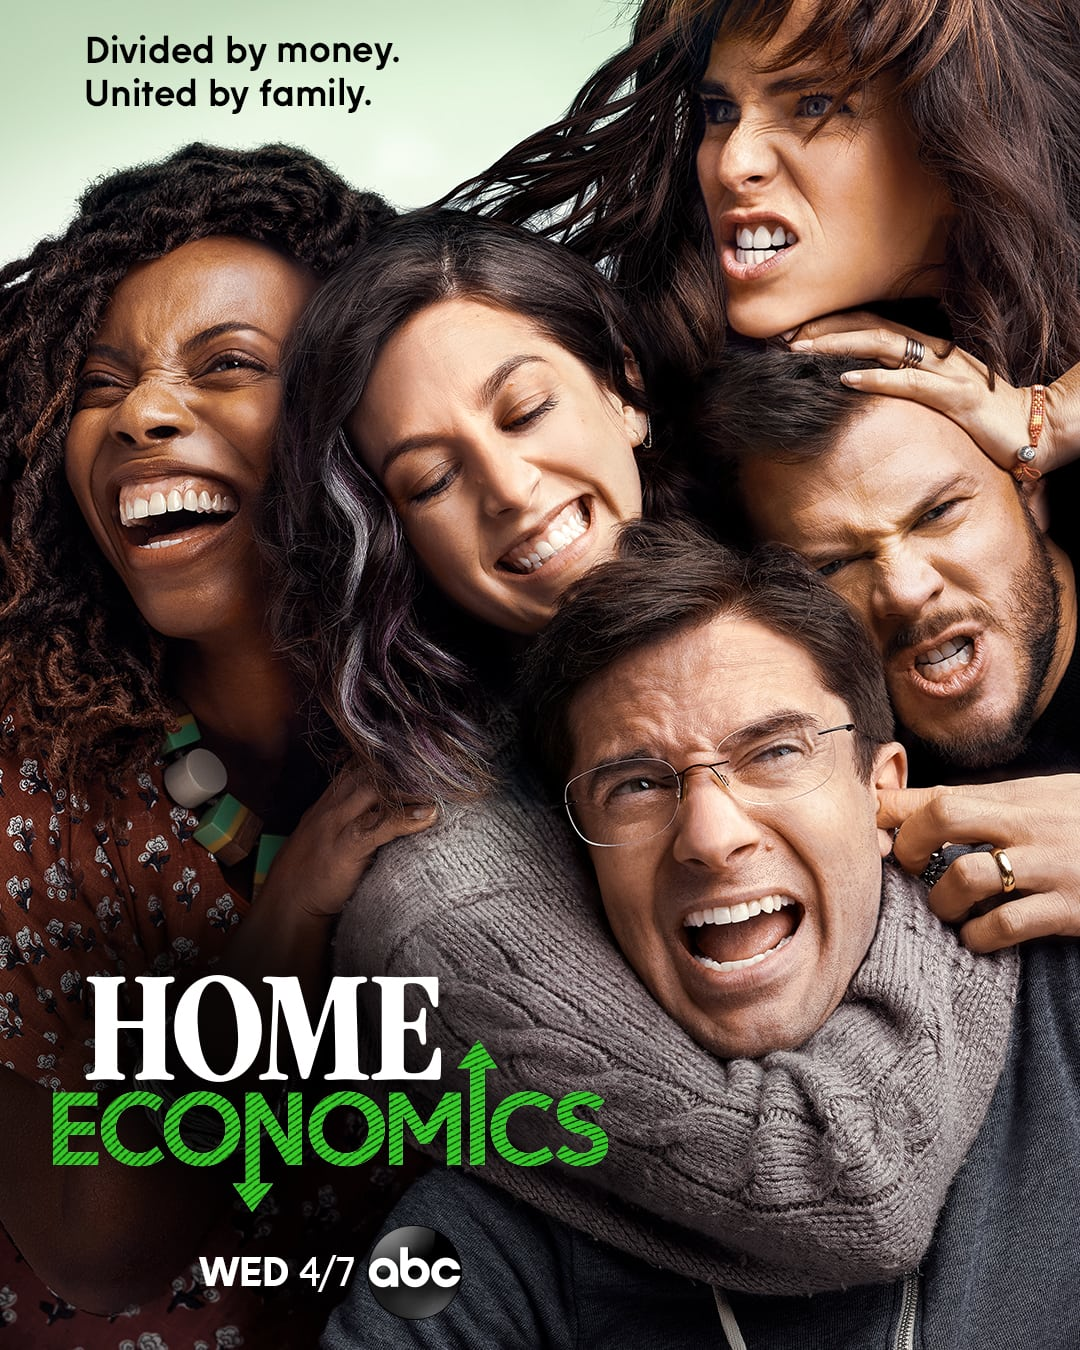 Home Economics Show Review